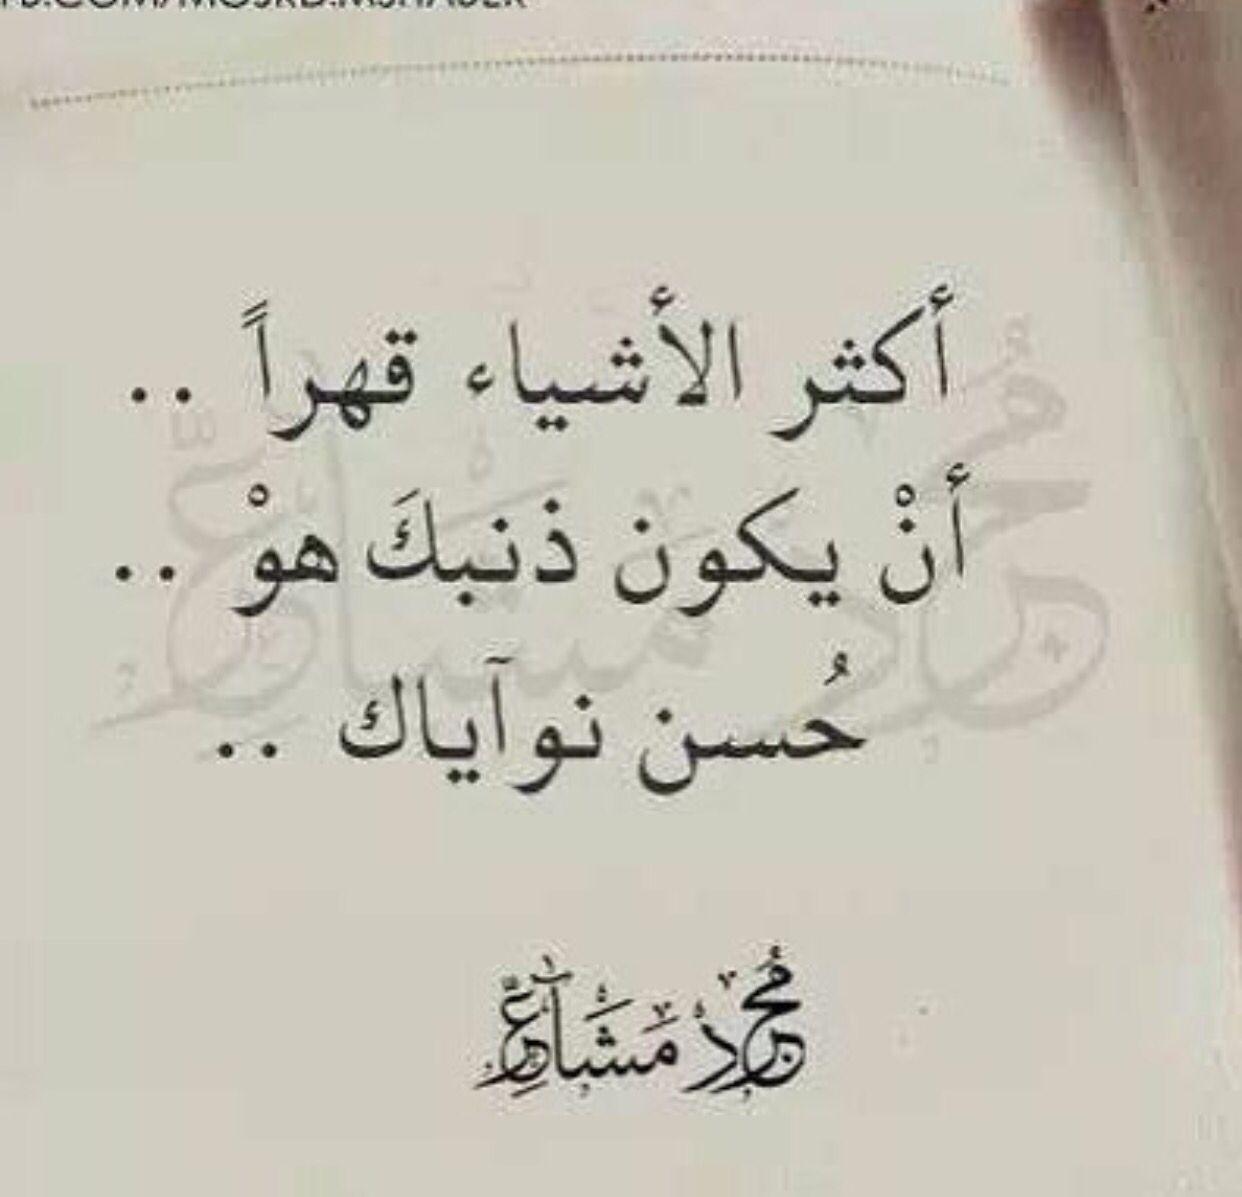 صعب كتير الظلم Words Quotes Love Smile Quotes Words Can Hurt